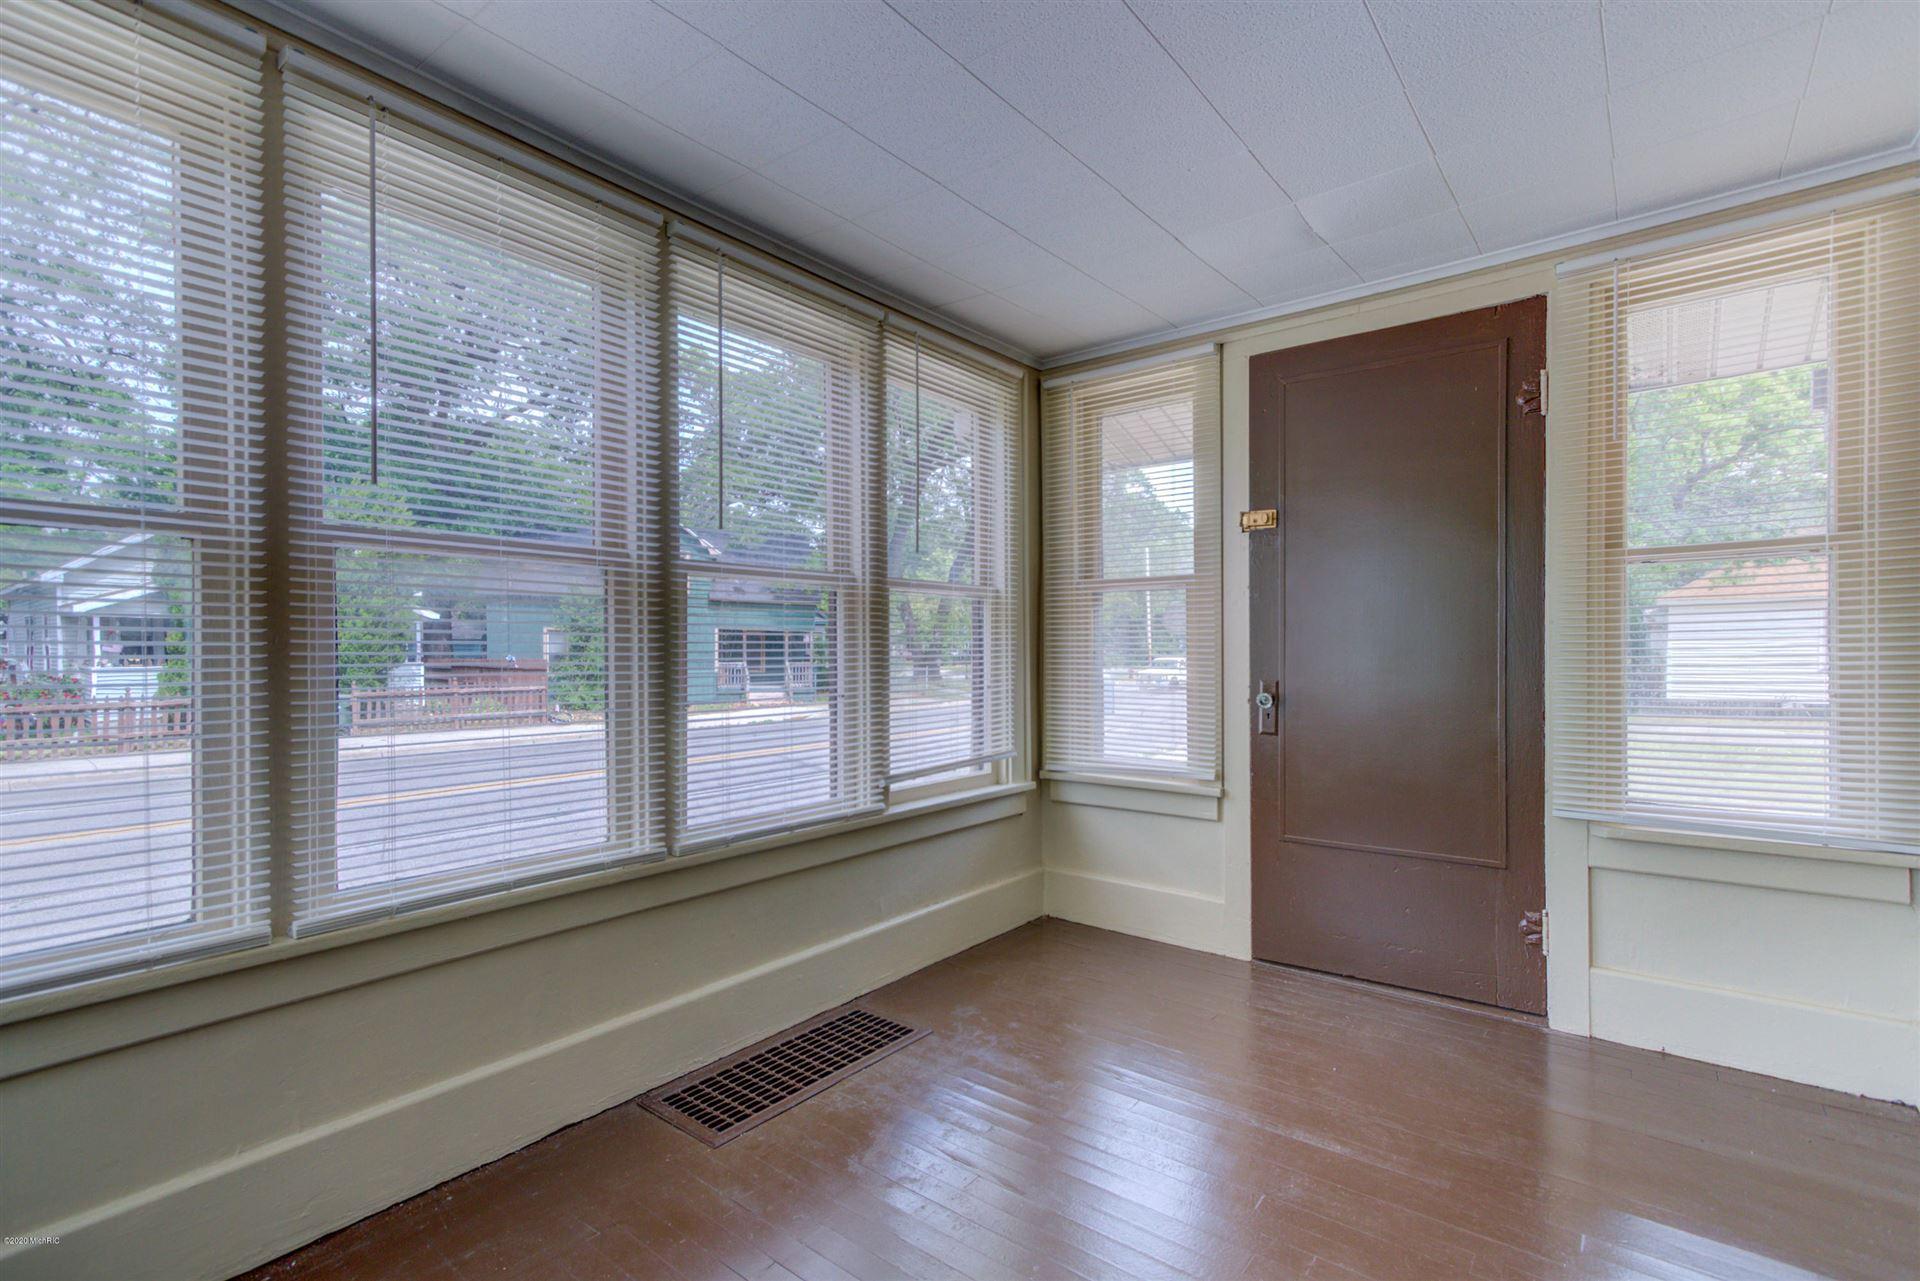 Photo of 1408 S Getty Street, Muskegon, MI 49442 (MLS # 20023591)